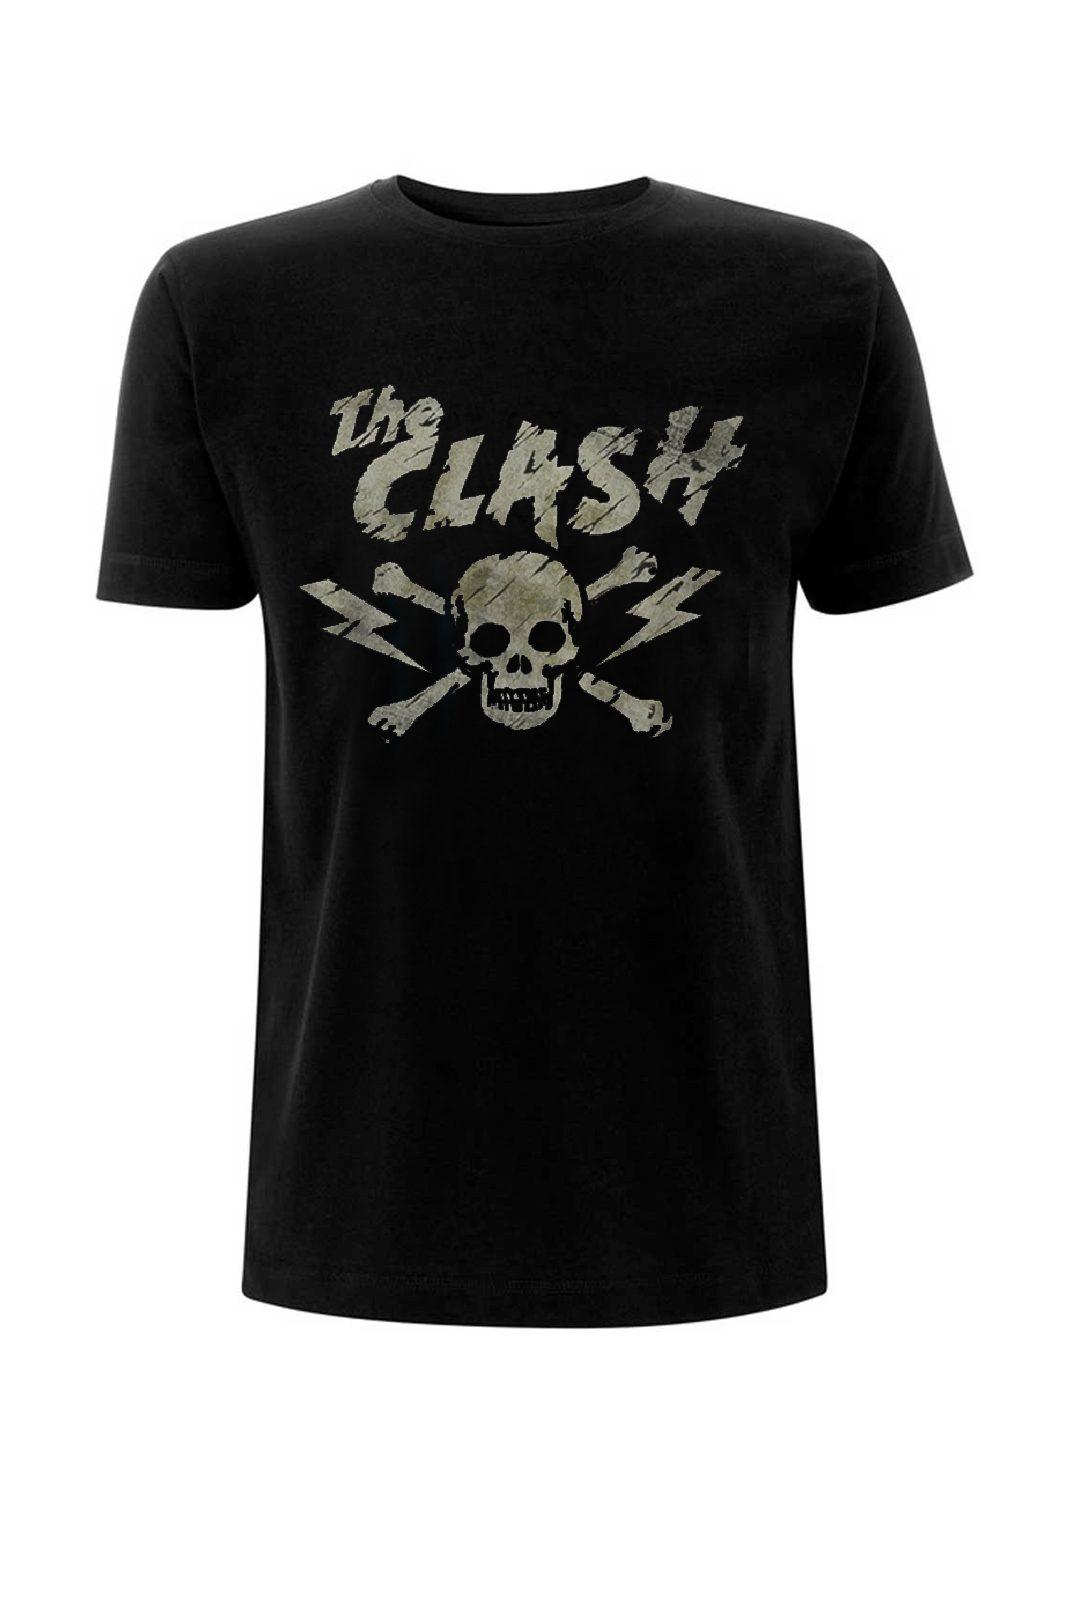 Tee Clash The Grunge Skull Black